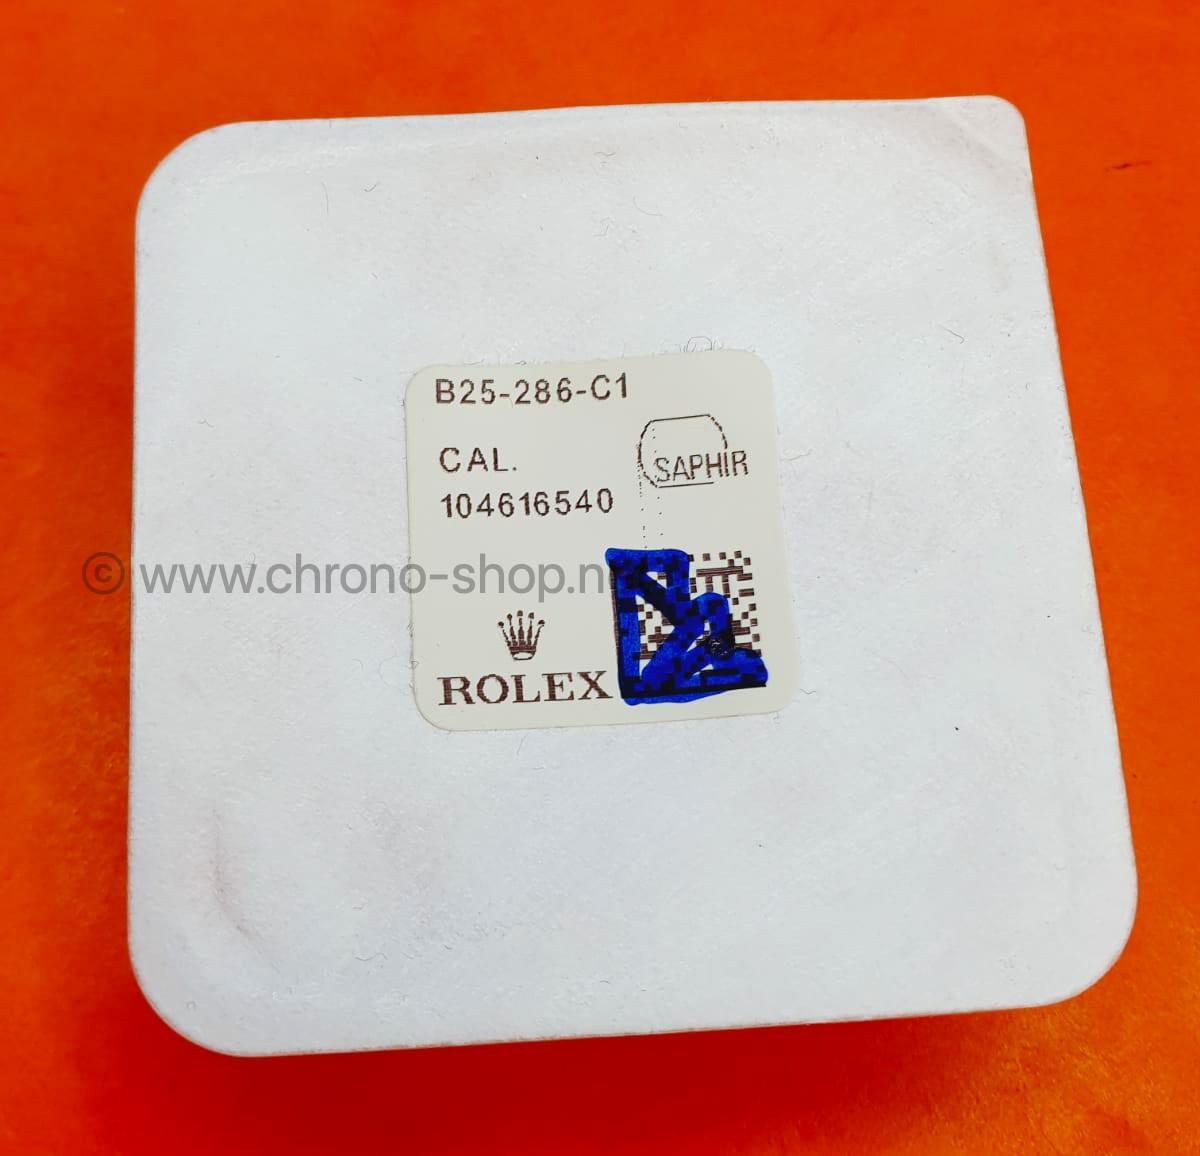 Rolex Genuine NEW SEALED sapphire glass B25-286-C1 Ø29mm Submariner No Date 14060,14060M & AIRKING